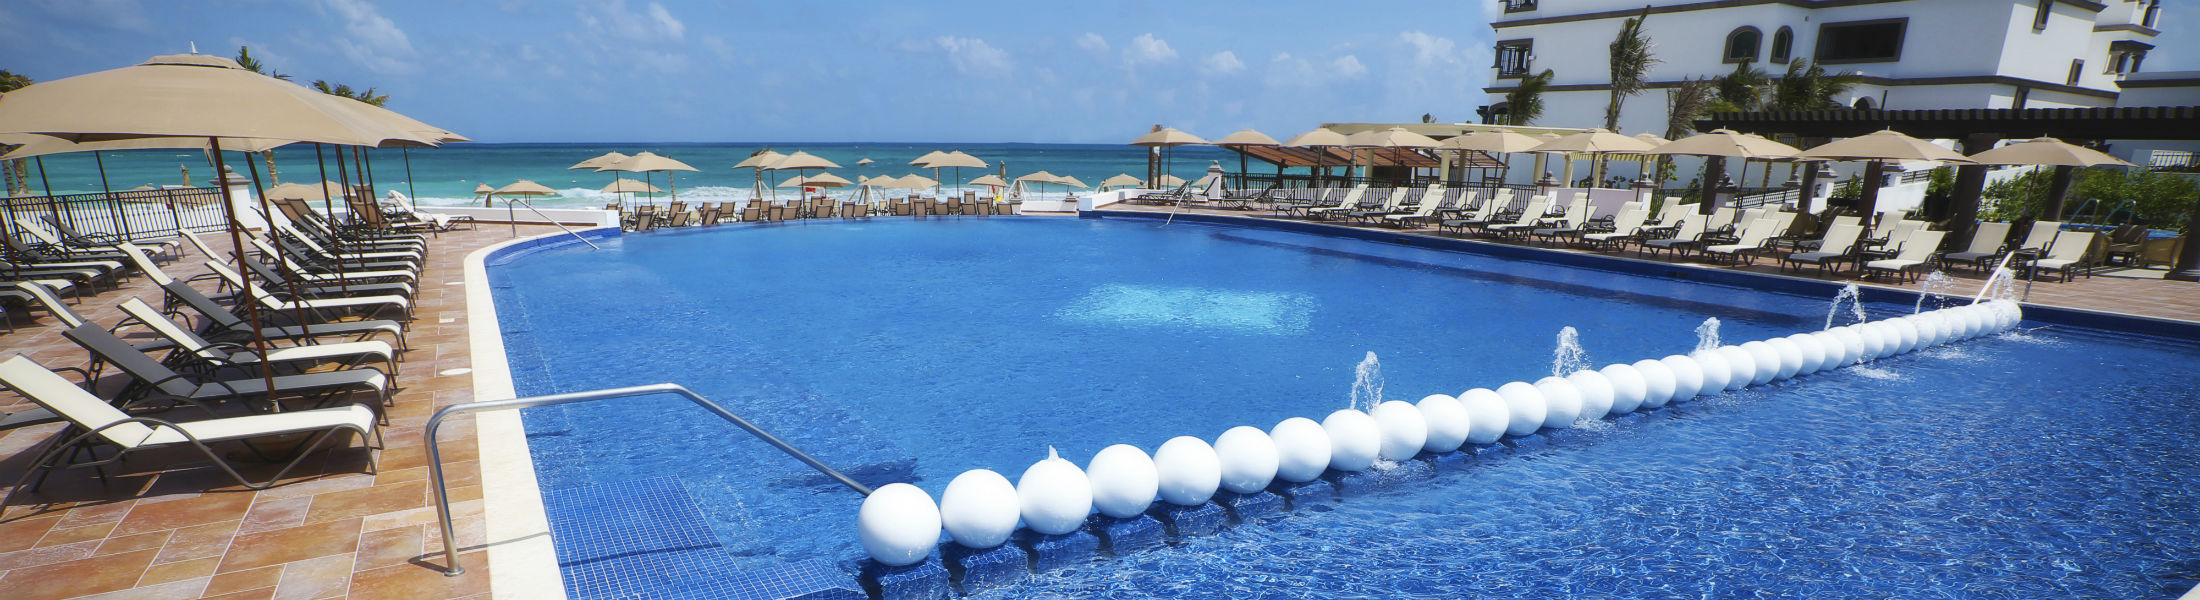 Grand Residences Riviera Cancun Main swimming pool